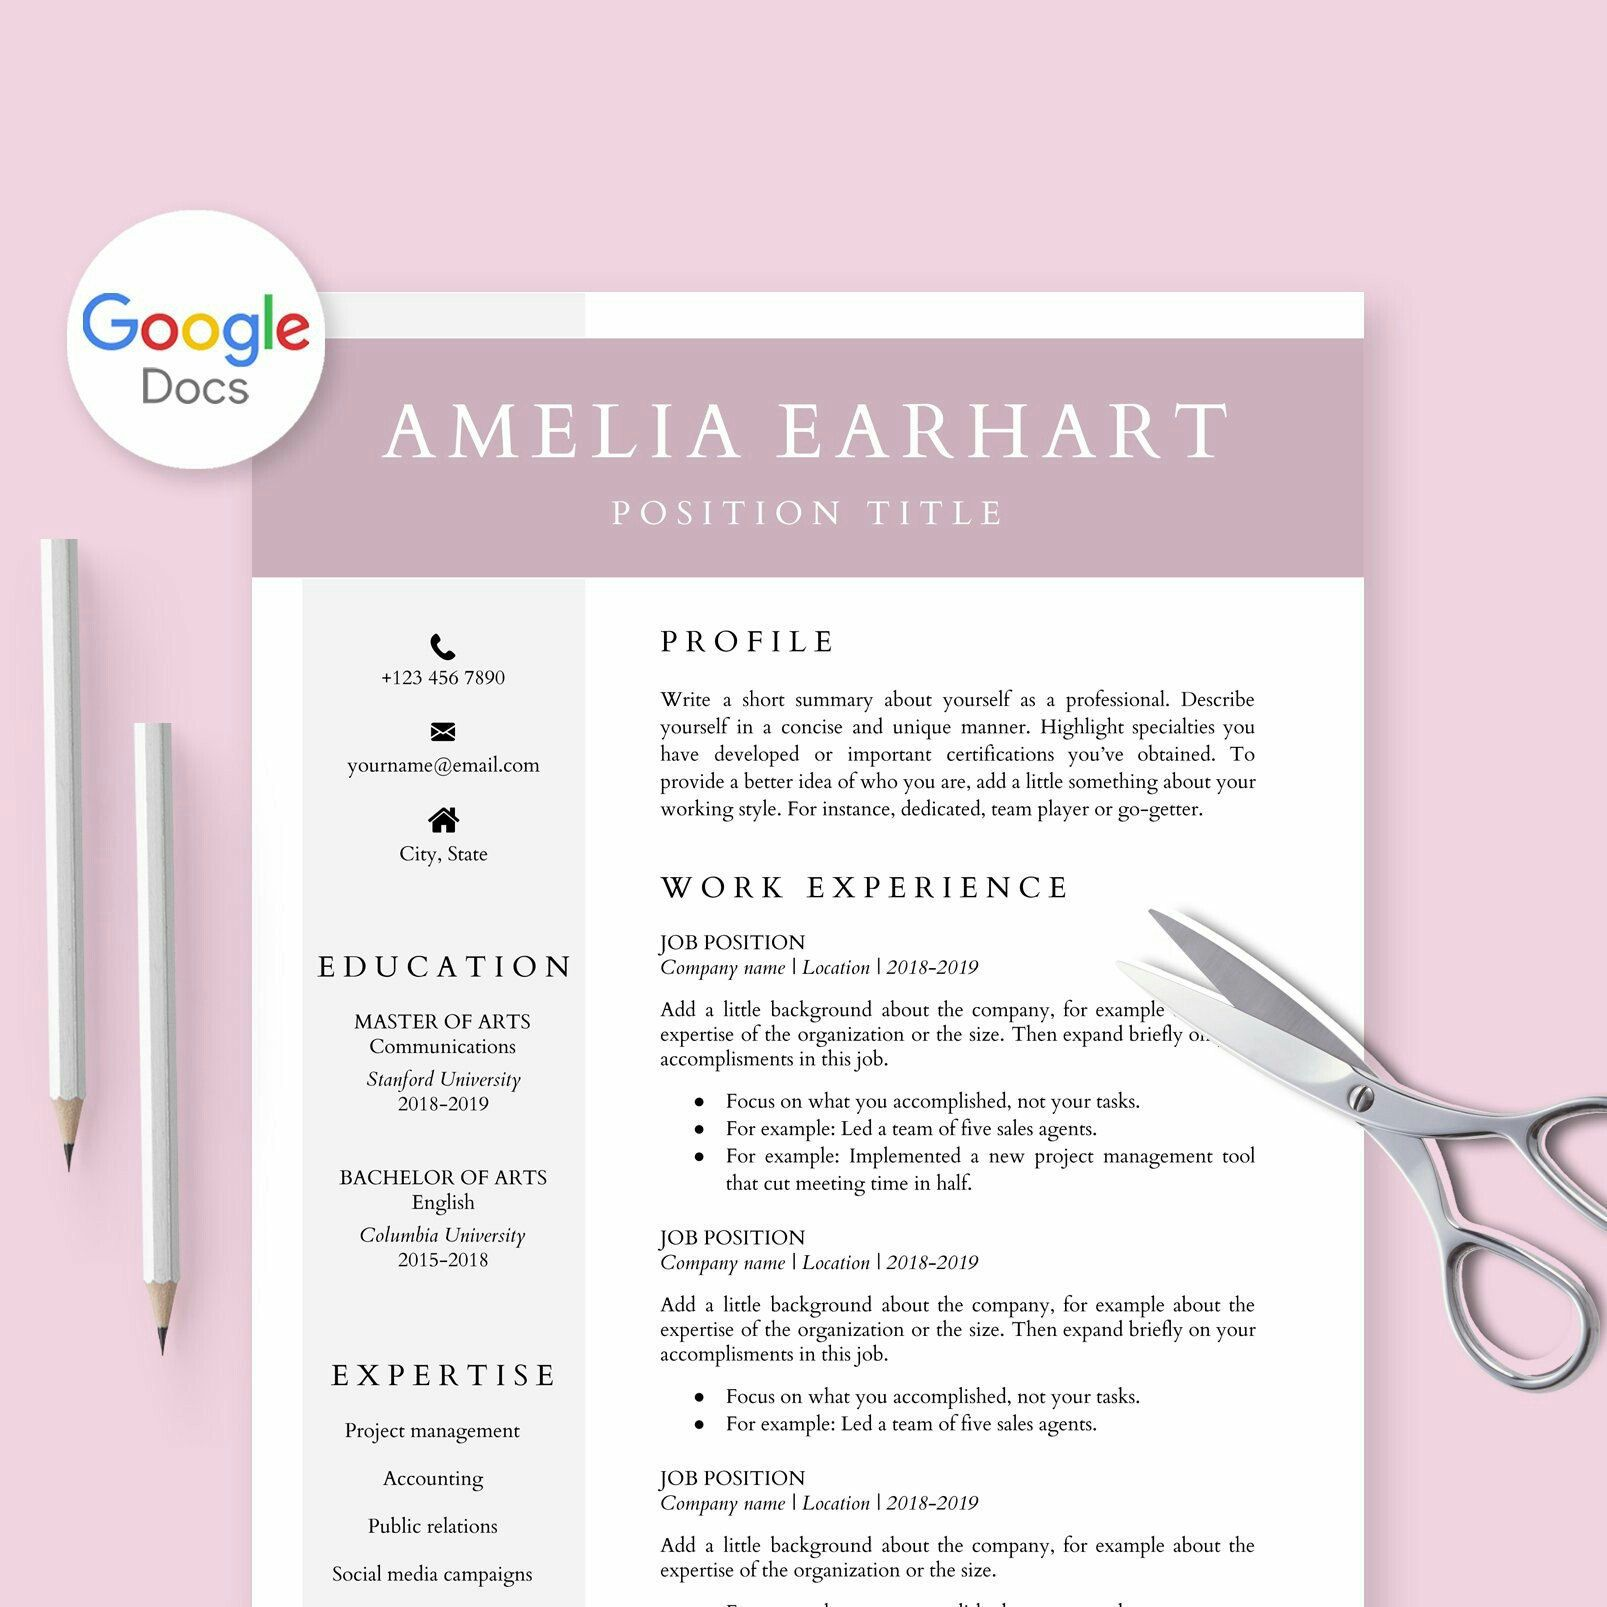 Resume Templates Download Google Docs (4) TEMPLATES